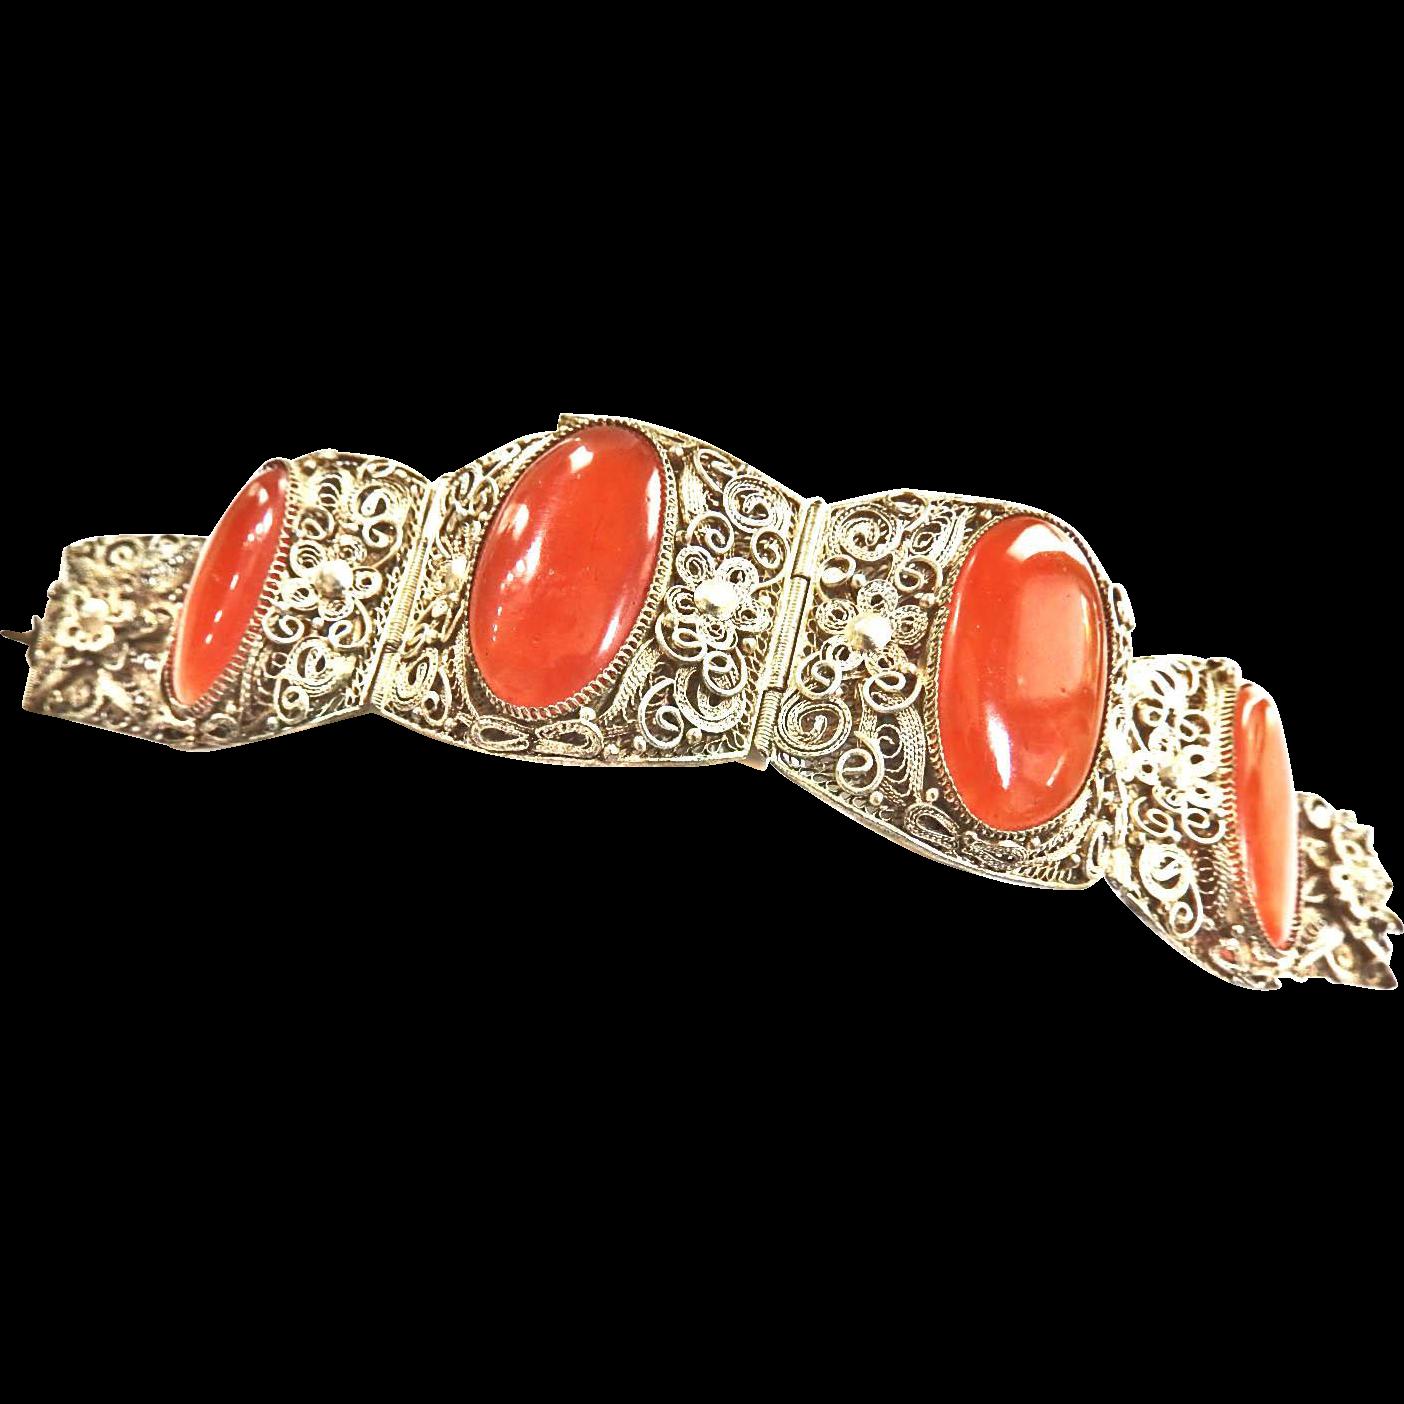 Vintage Asian Chinese Huge Carnelian Bracelet